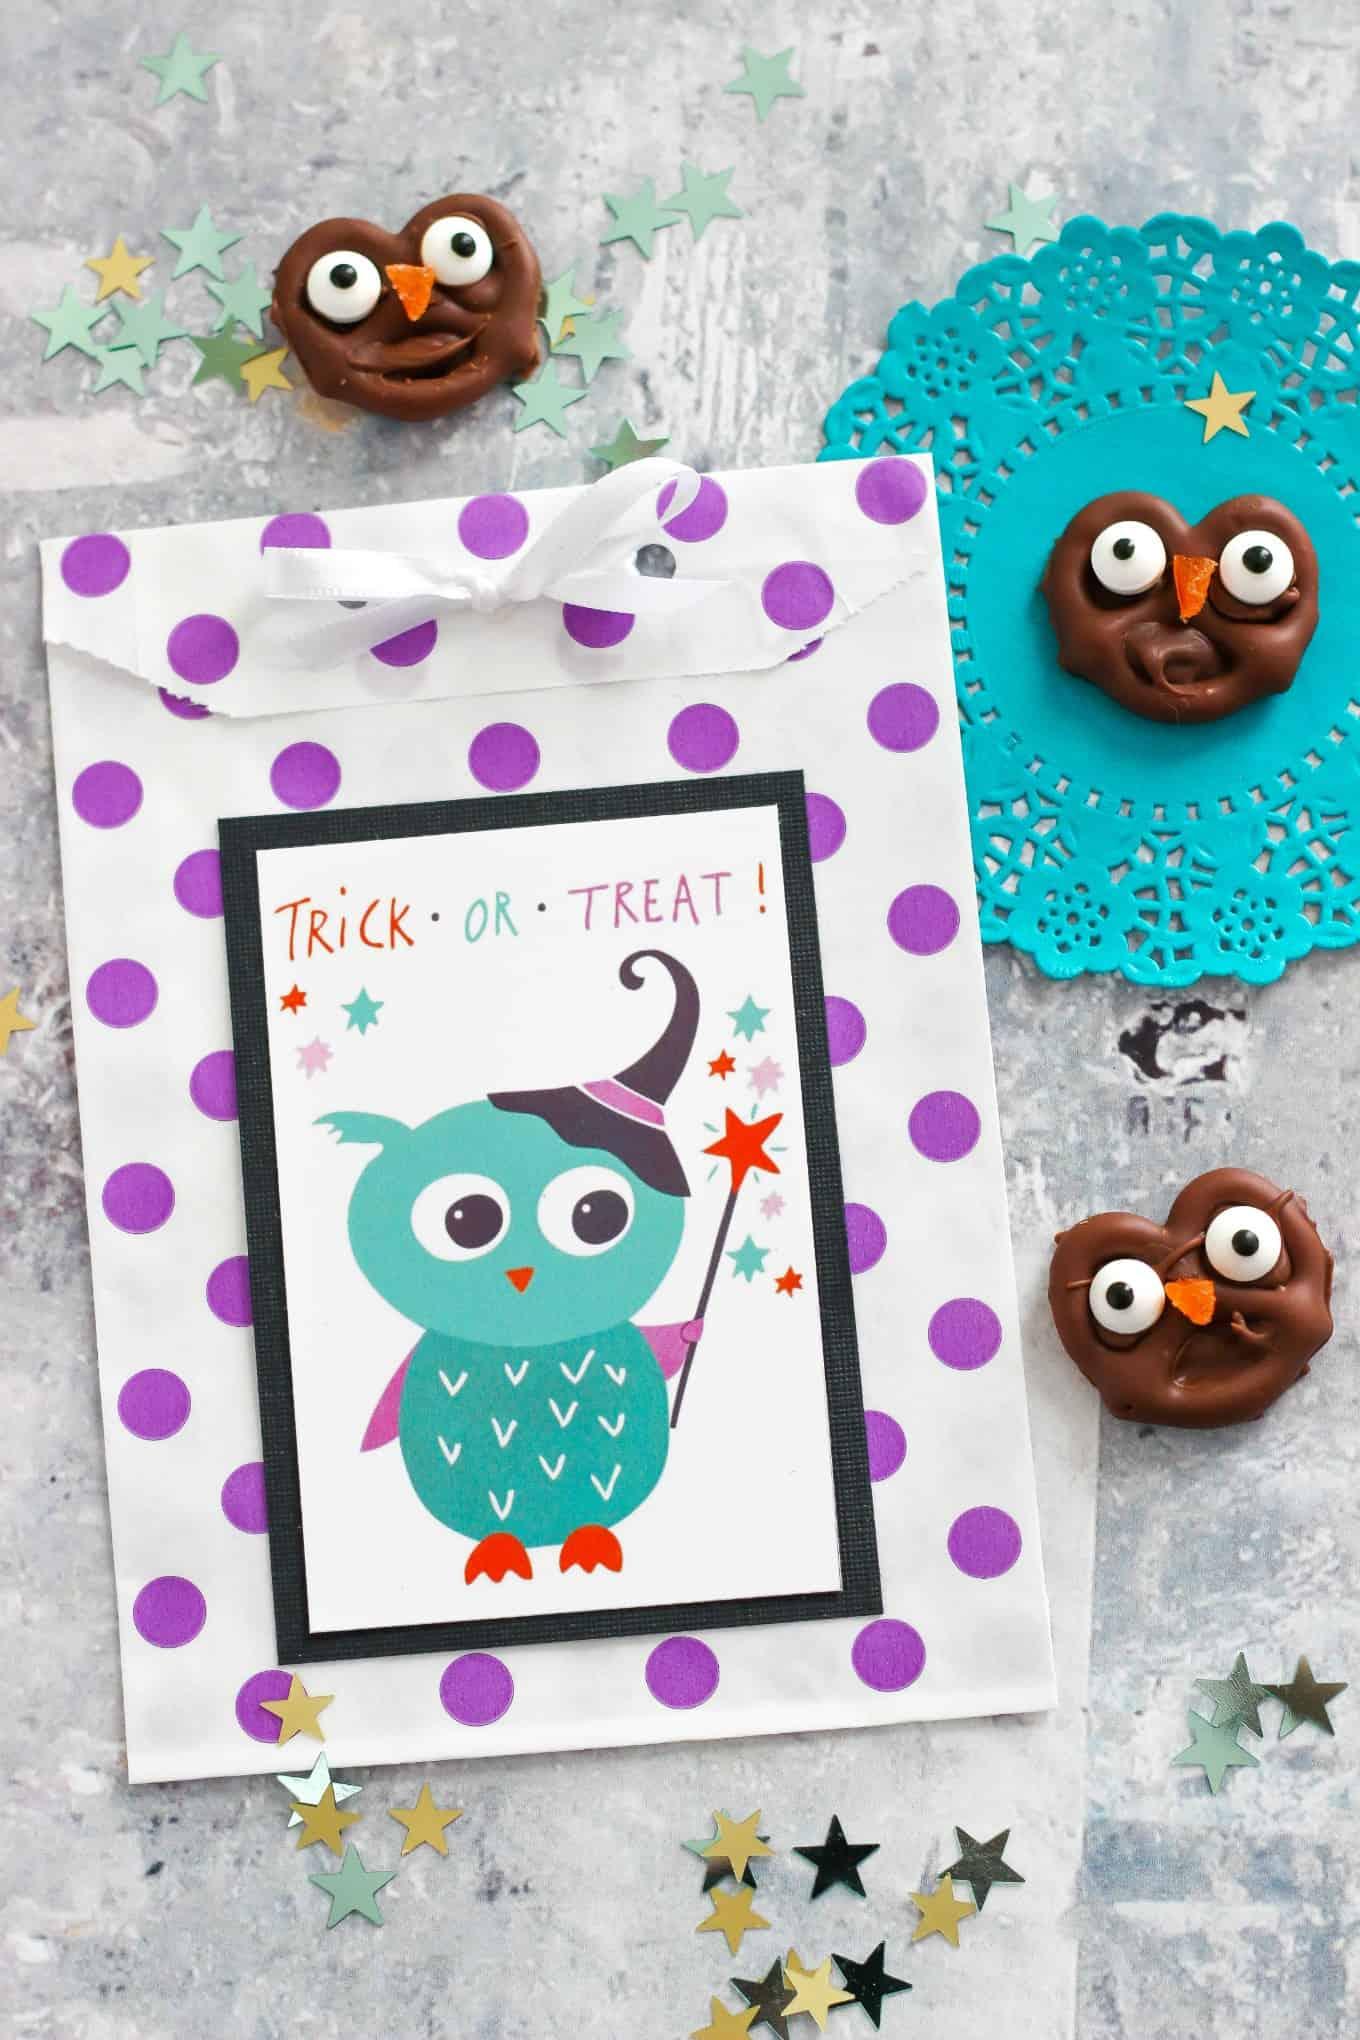 chocolate covered owl pretzels plus halloween printable